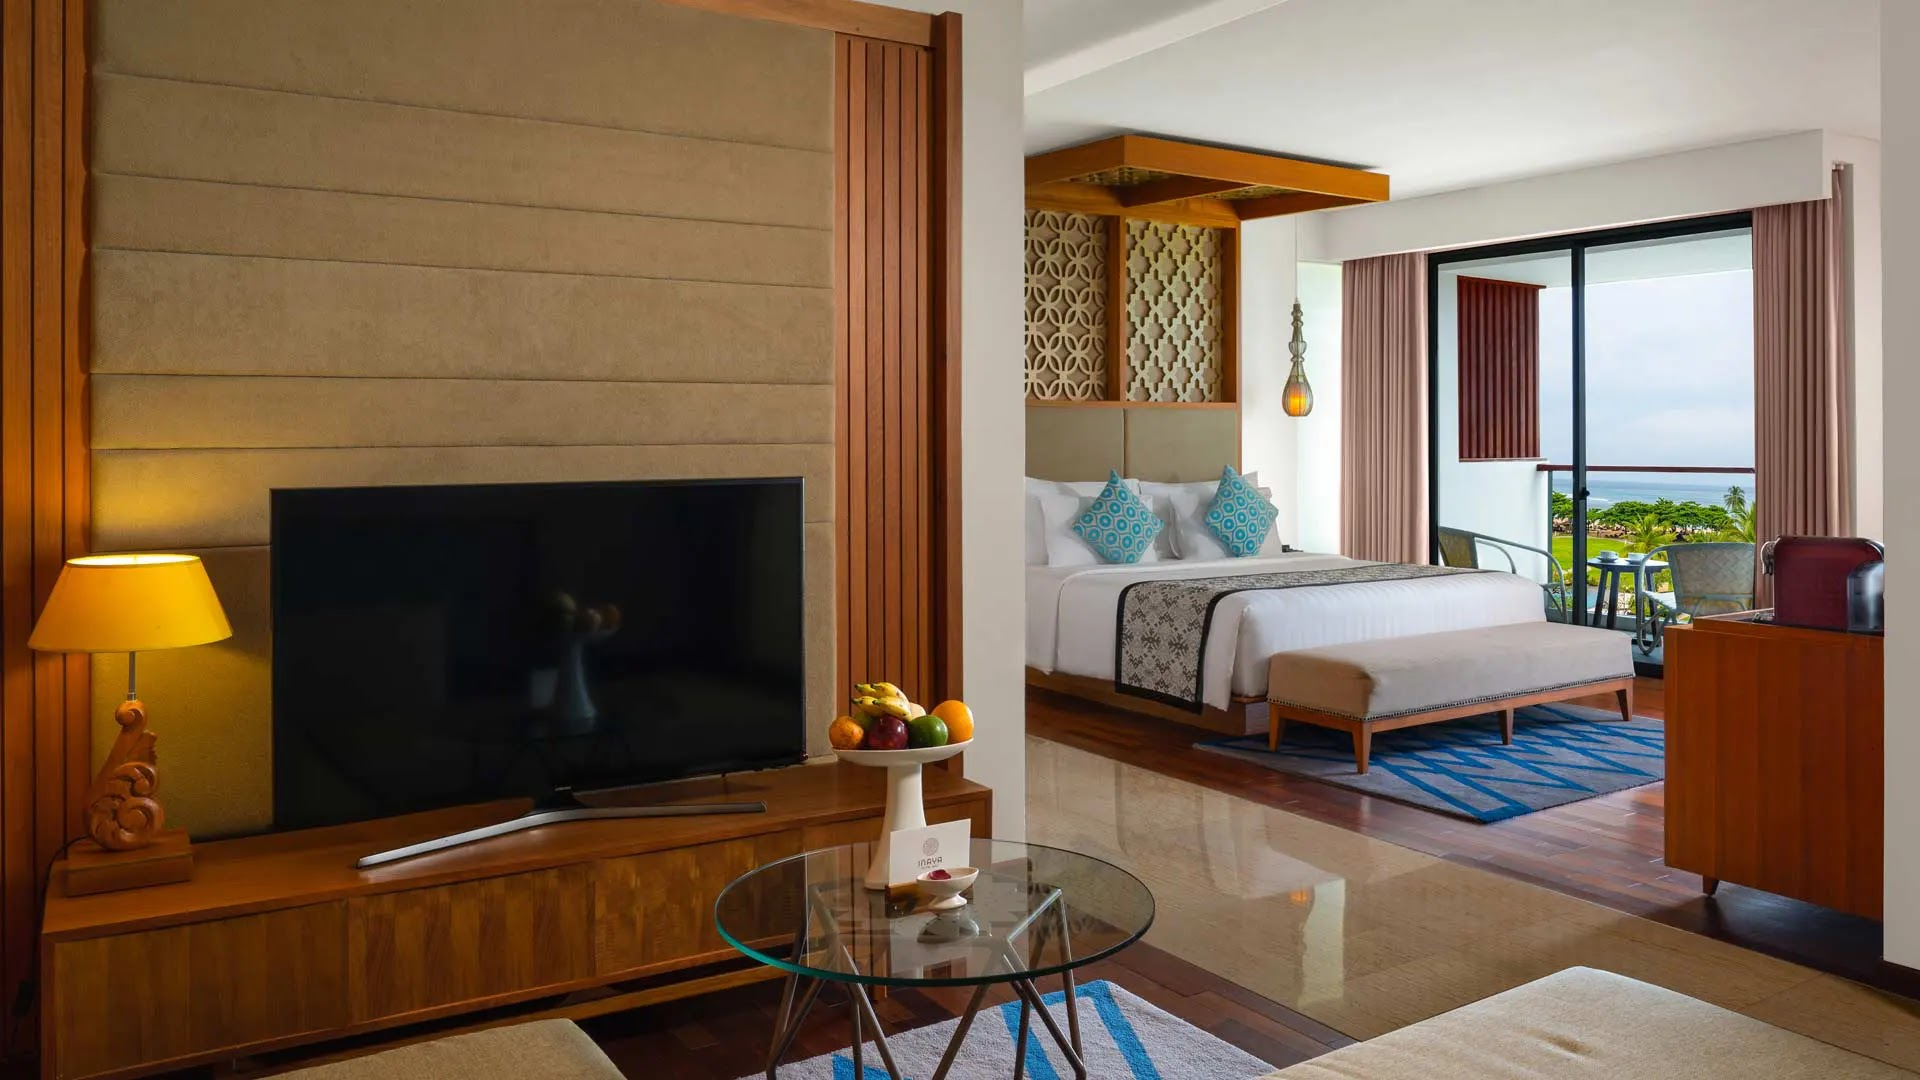 Interior Hotel Photography Suite Ocean View